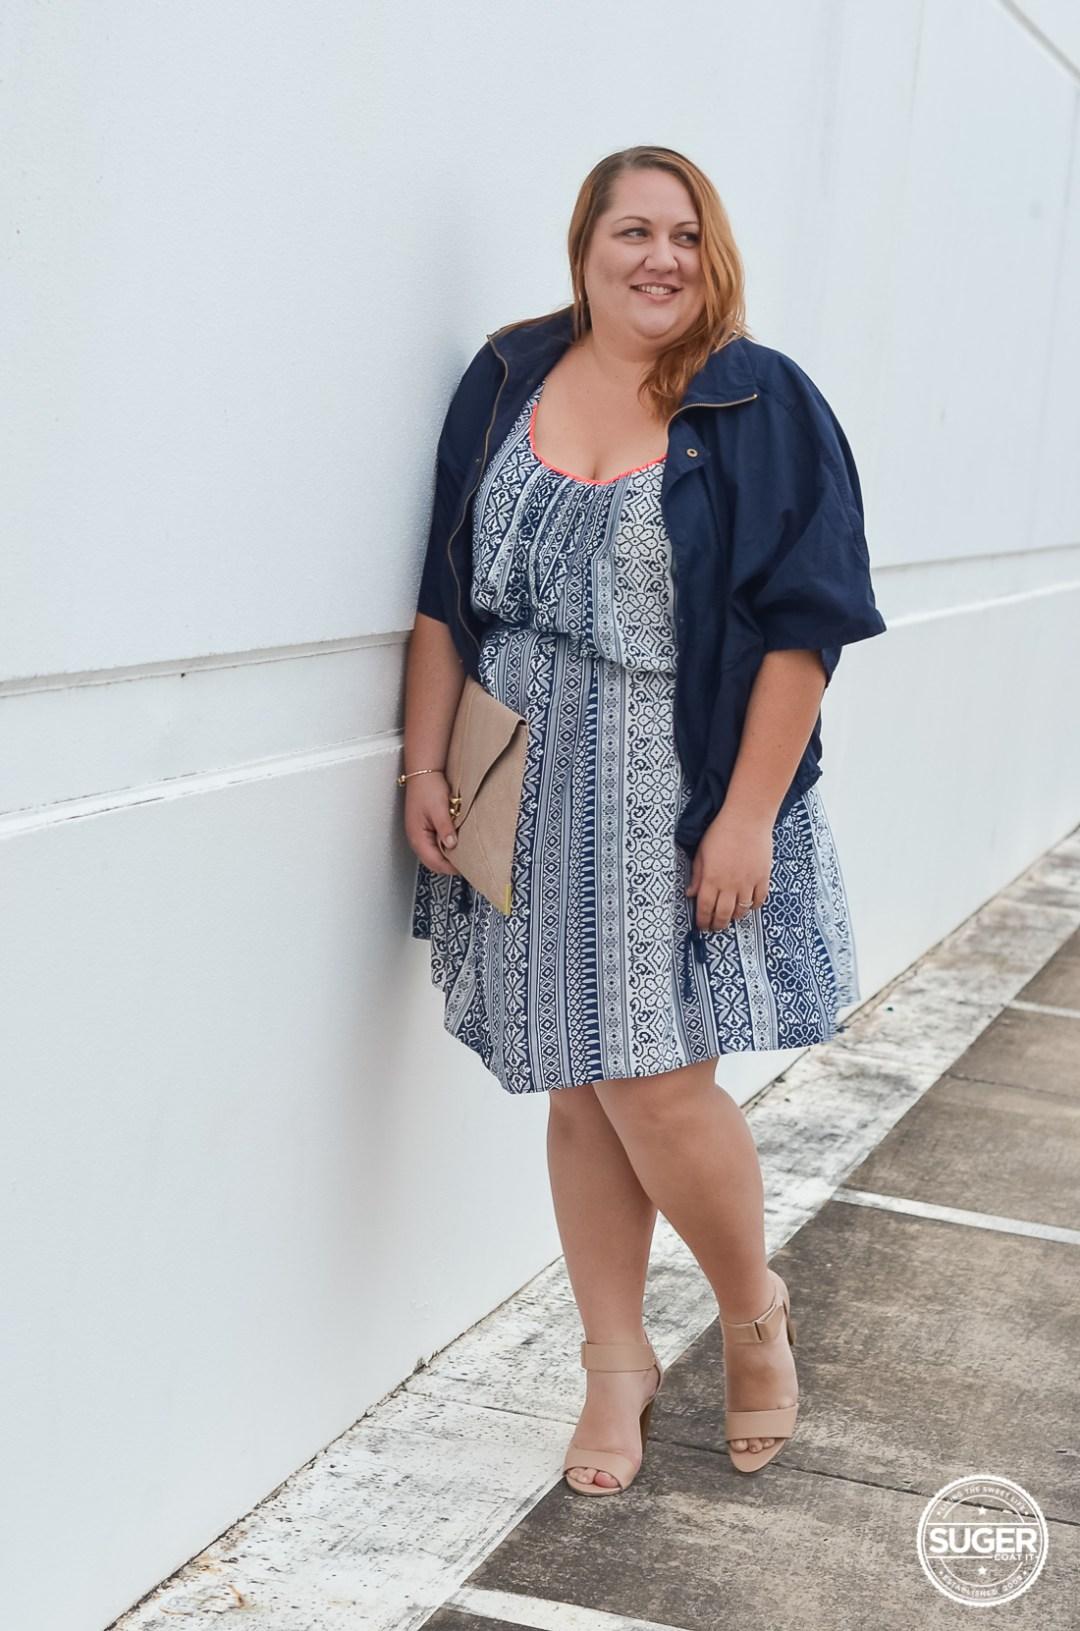 beme australia plus size fashion blogger review-9